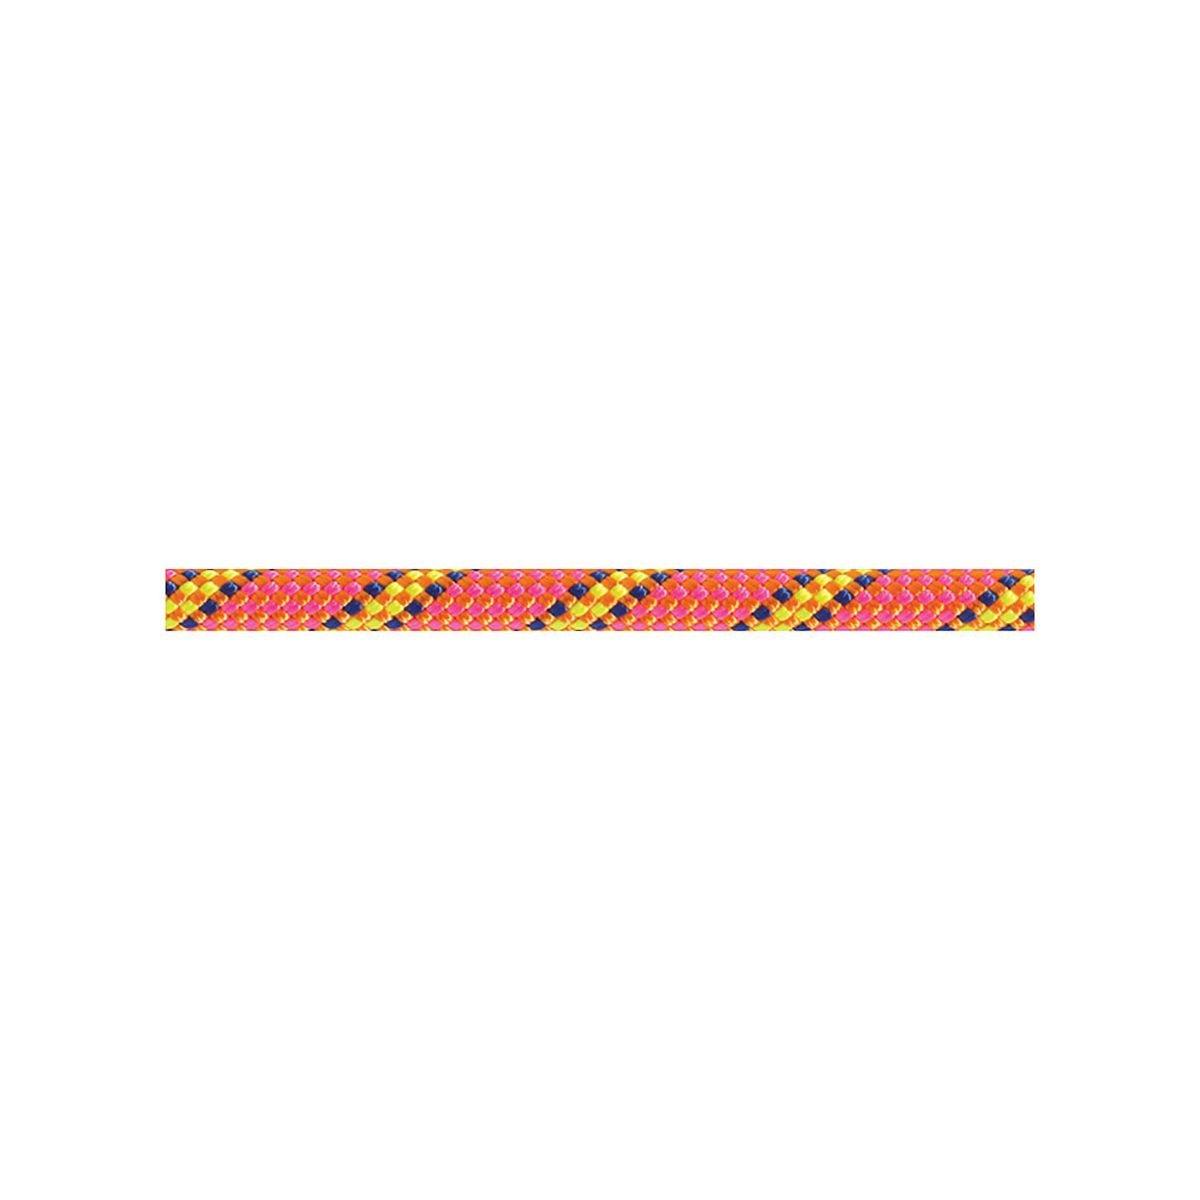 Cuerda Beal Karma 98mm 70m naranja BC098K